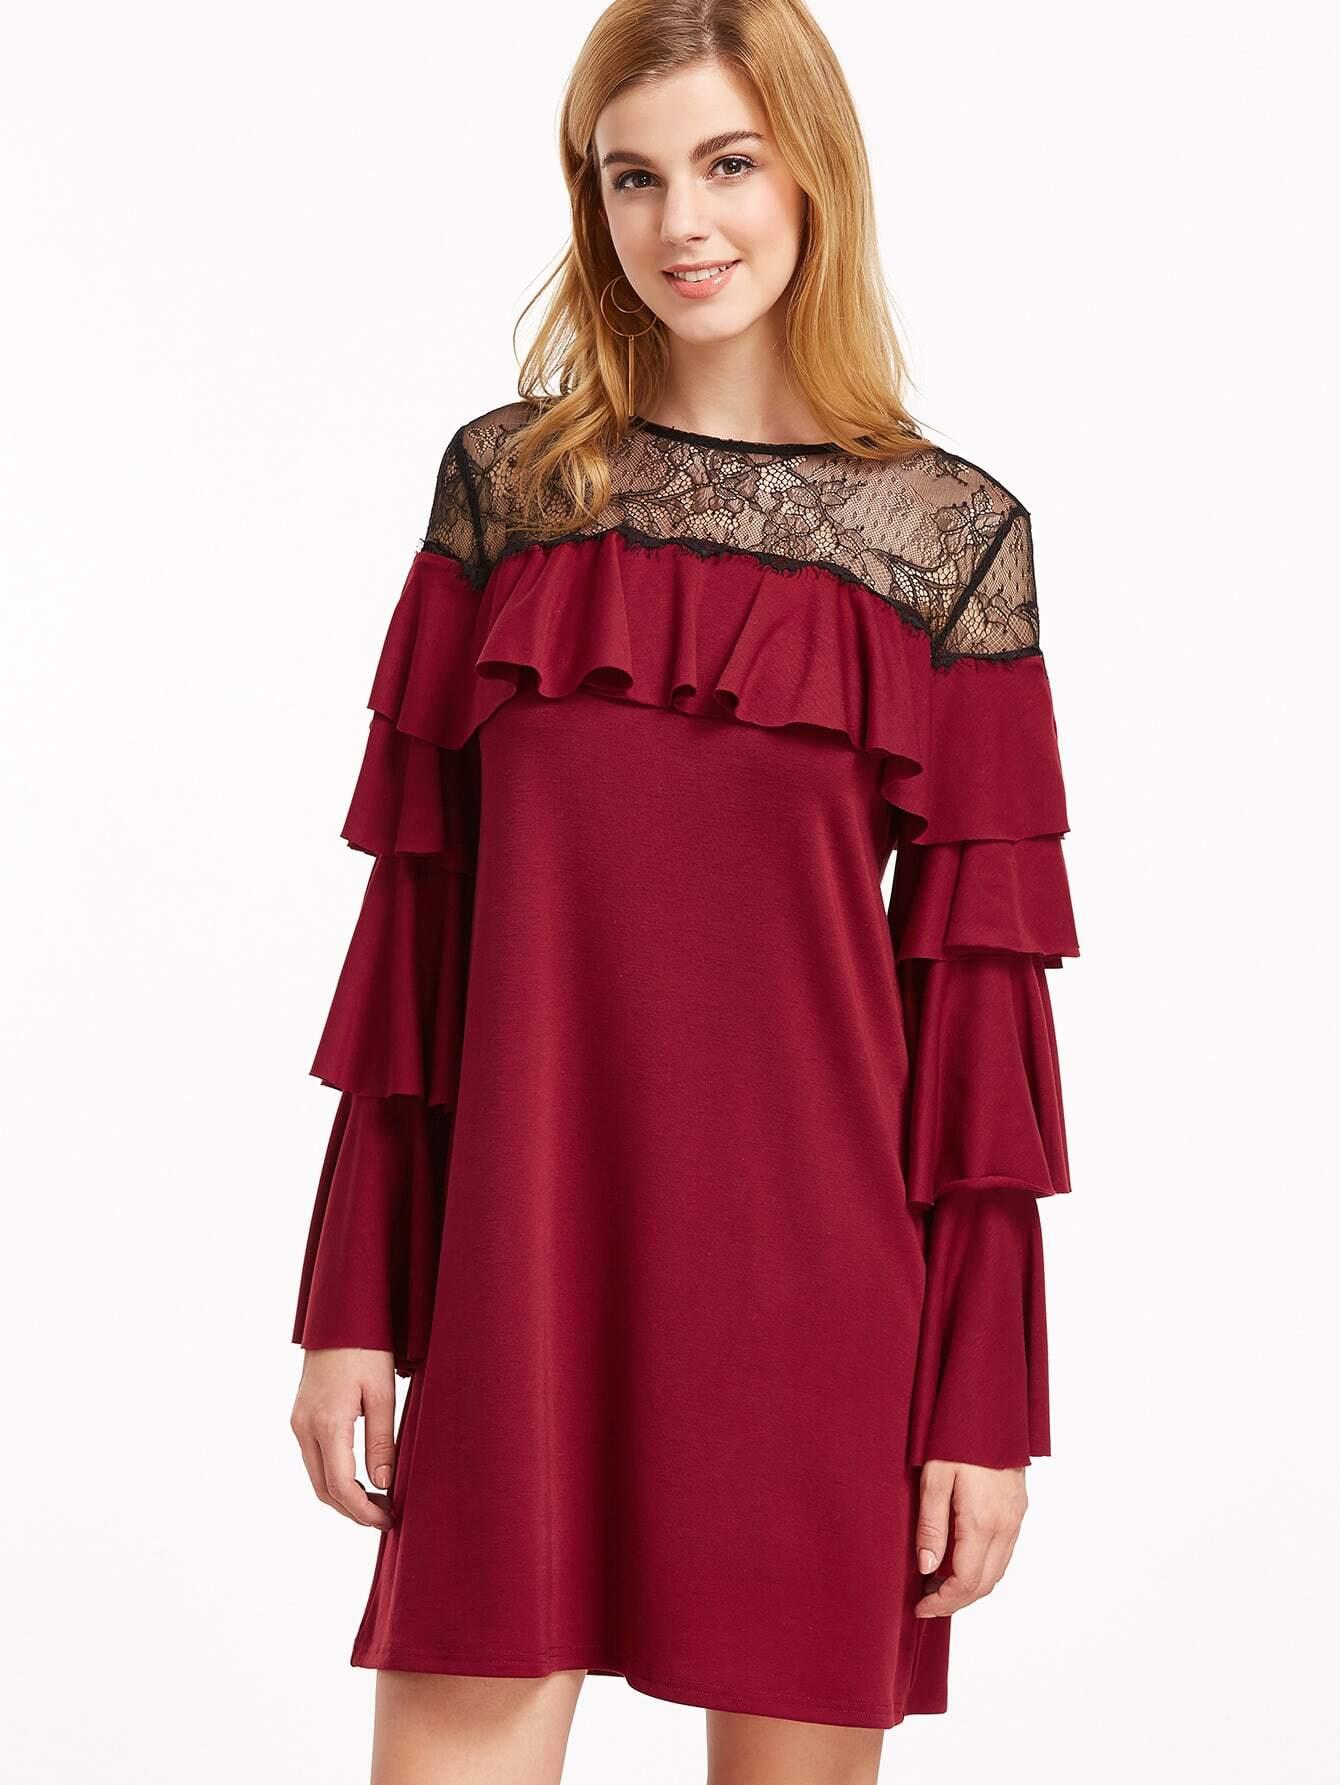 Фото Burgundy Contrast Sheer Neck Layered Sleeve Ruffle Dress. Купить с доставкой